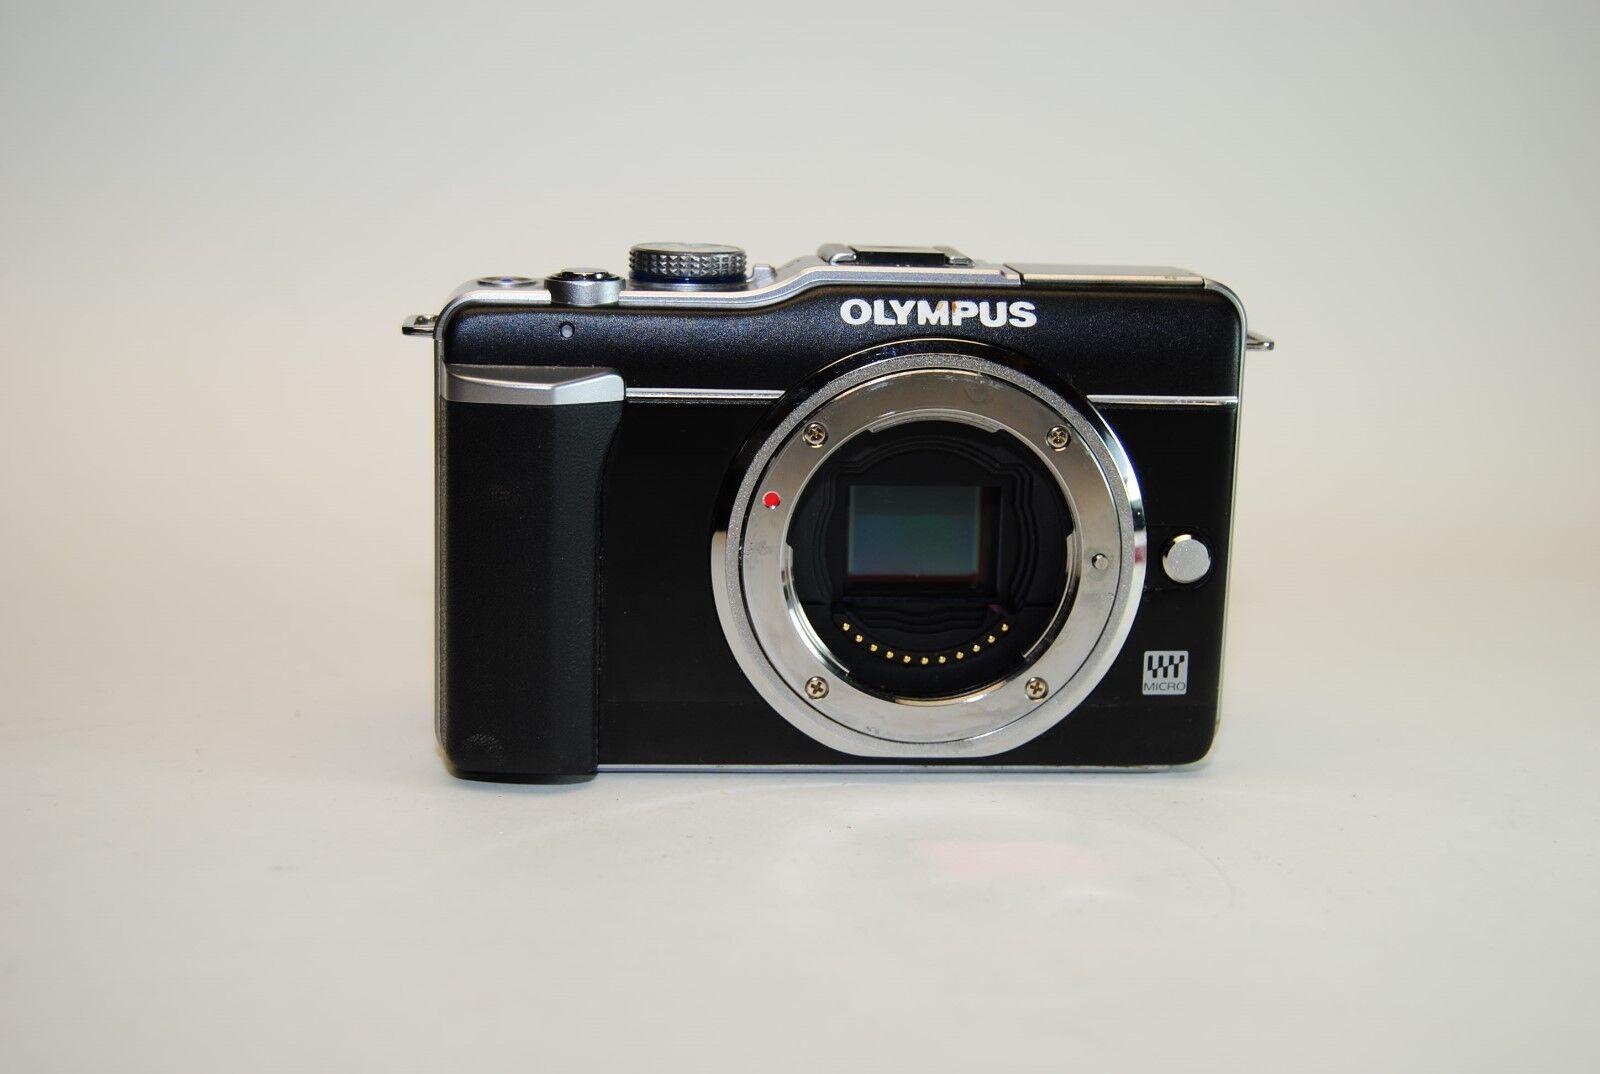 Fotocamera digitale olympus pen e-pl1 53